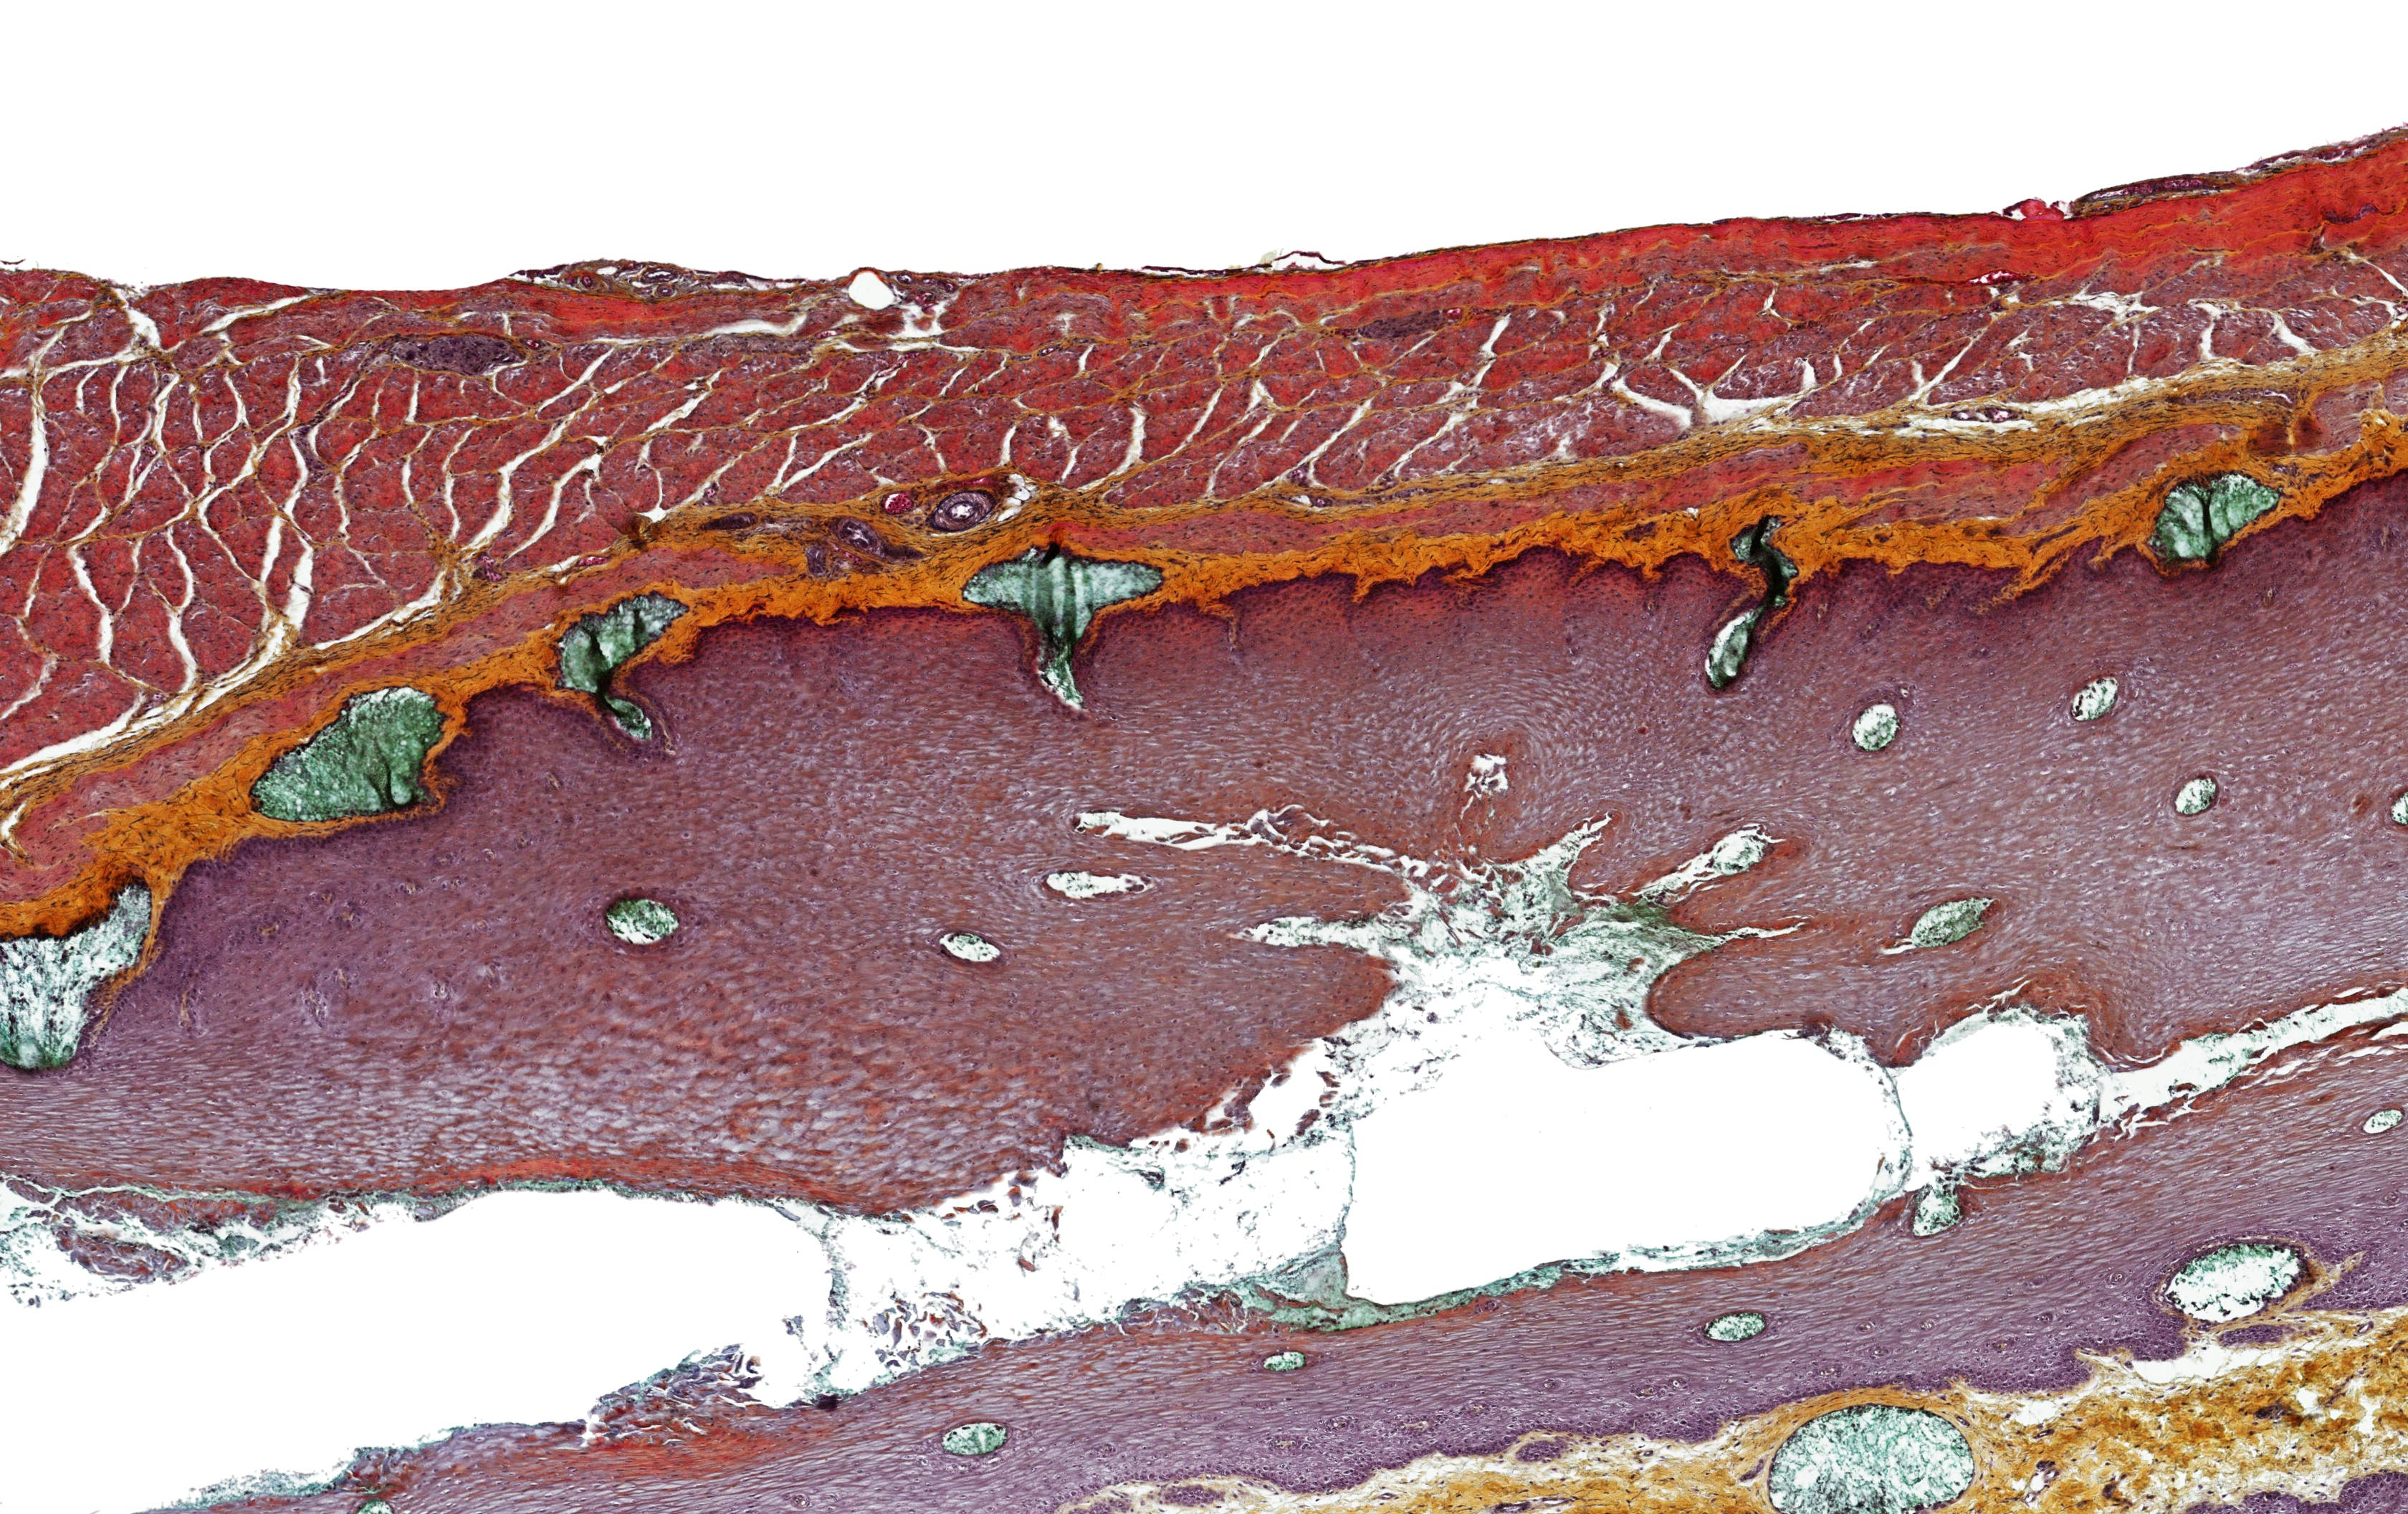 ALTHISIA movat pentachrome 4